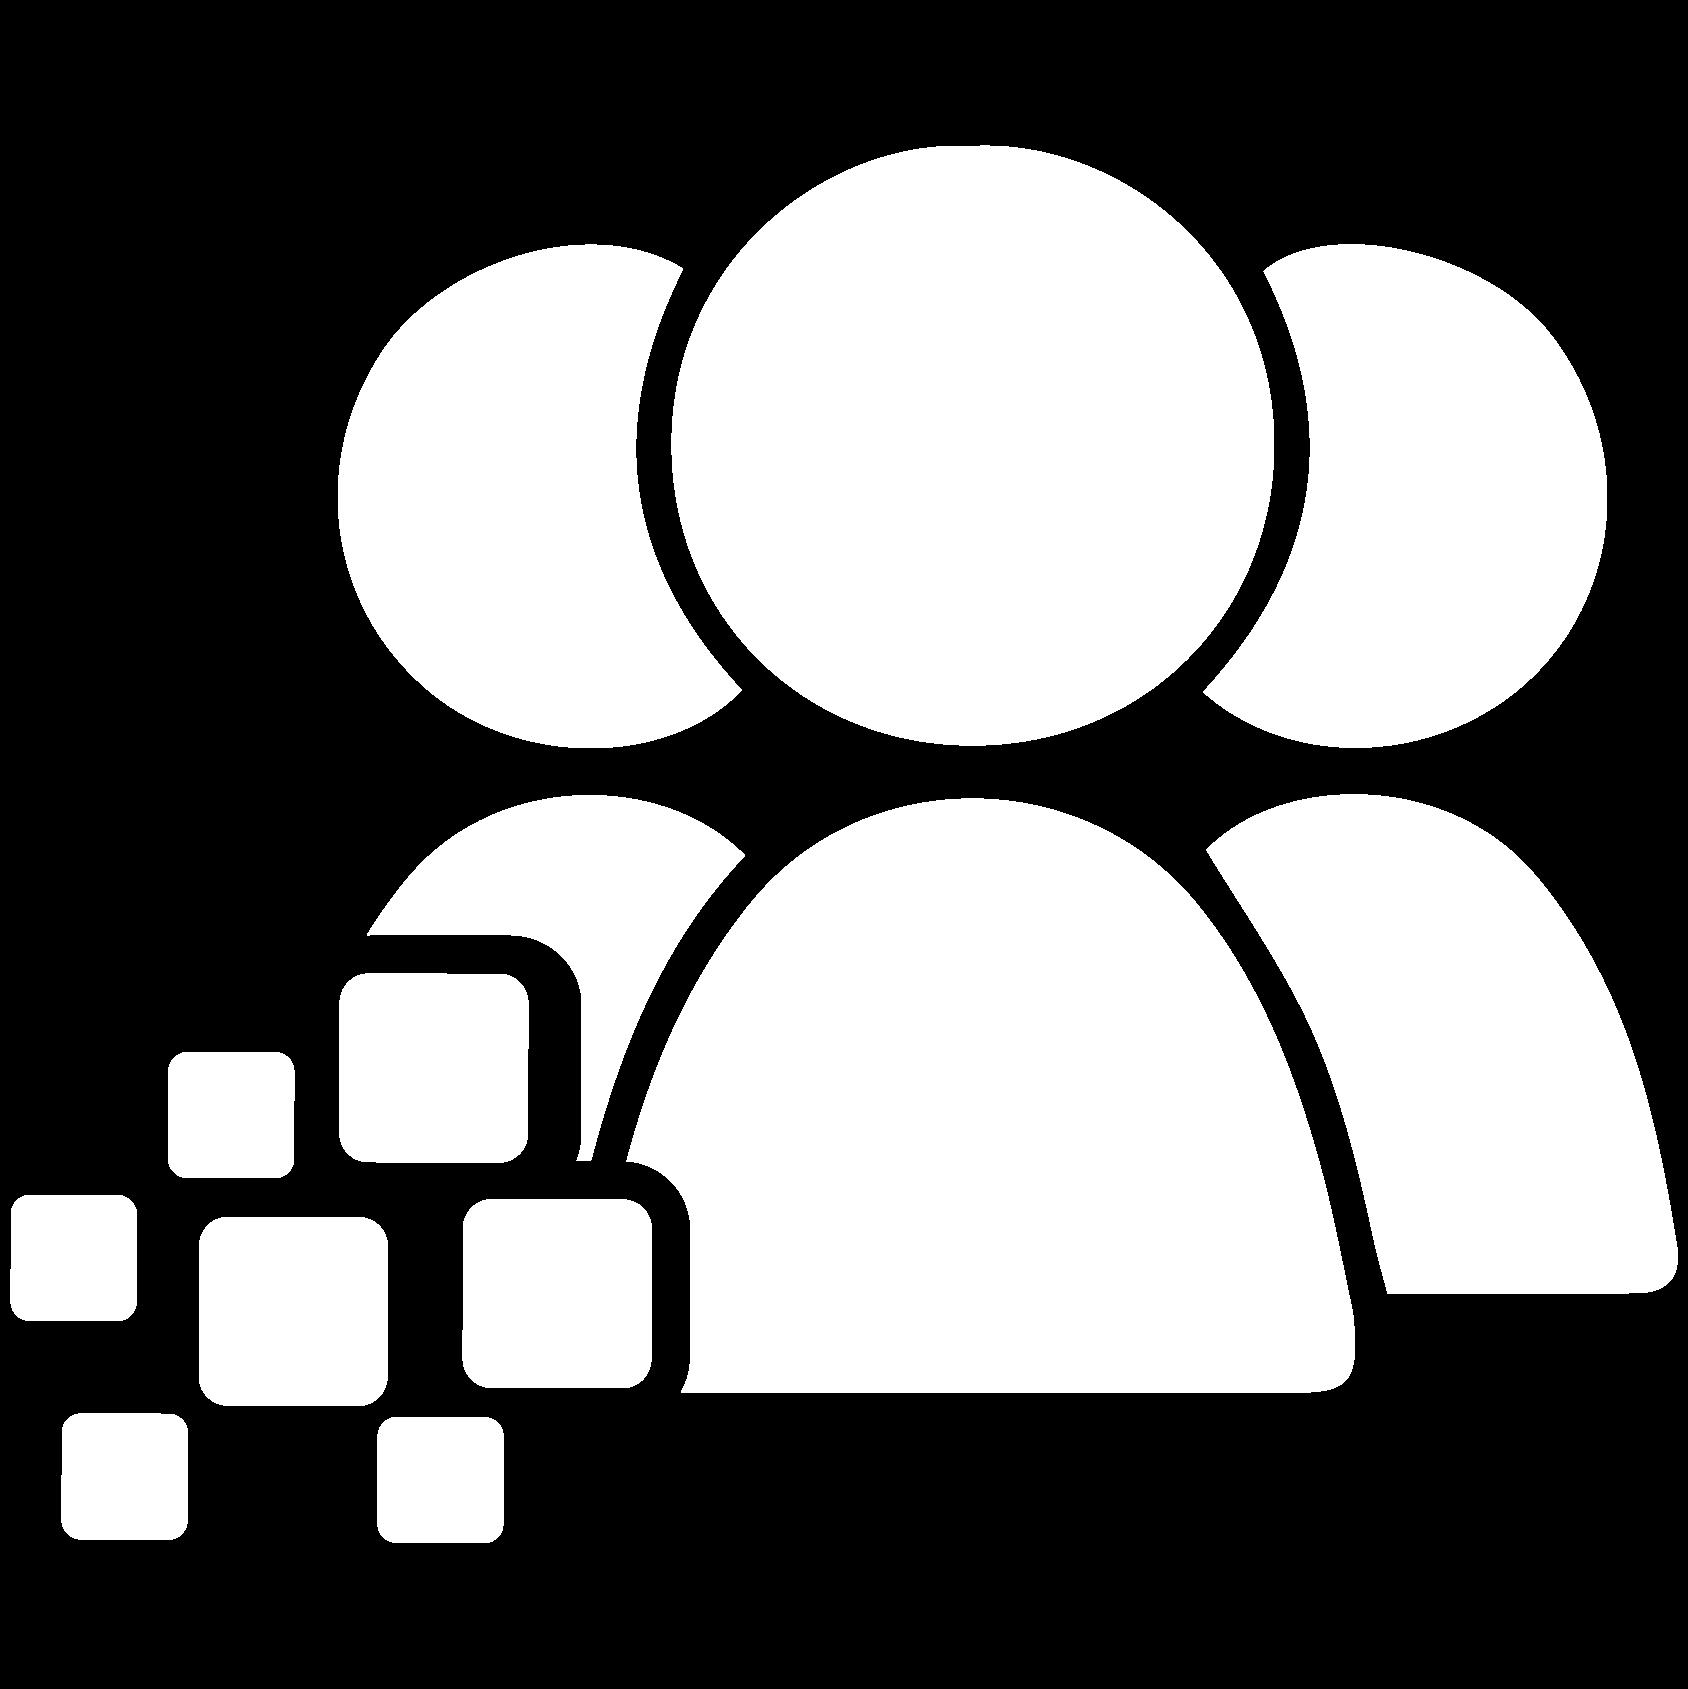 PatientPortal-Icon-White-12